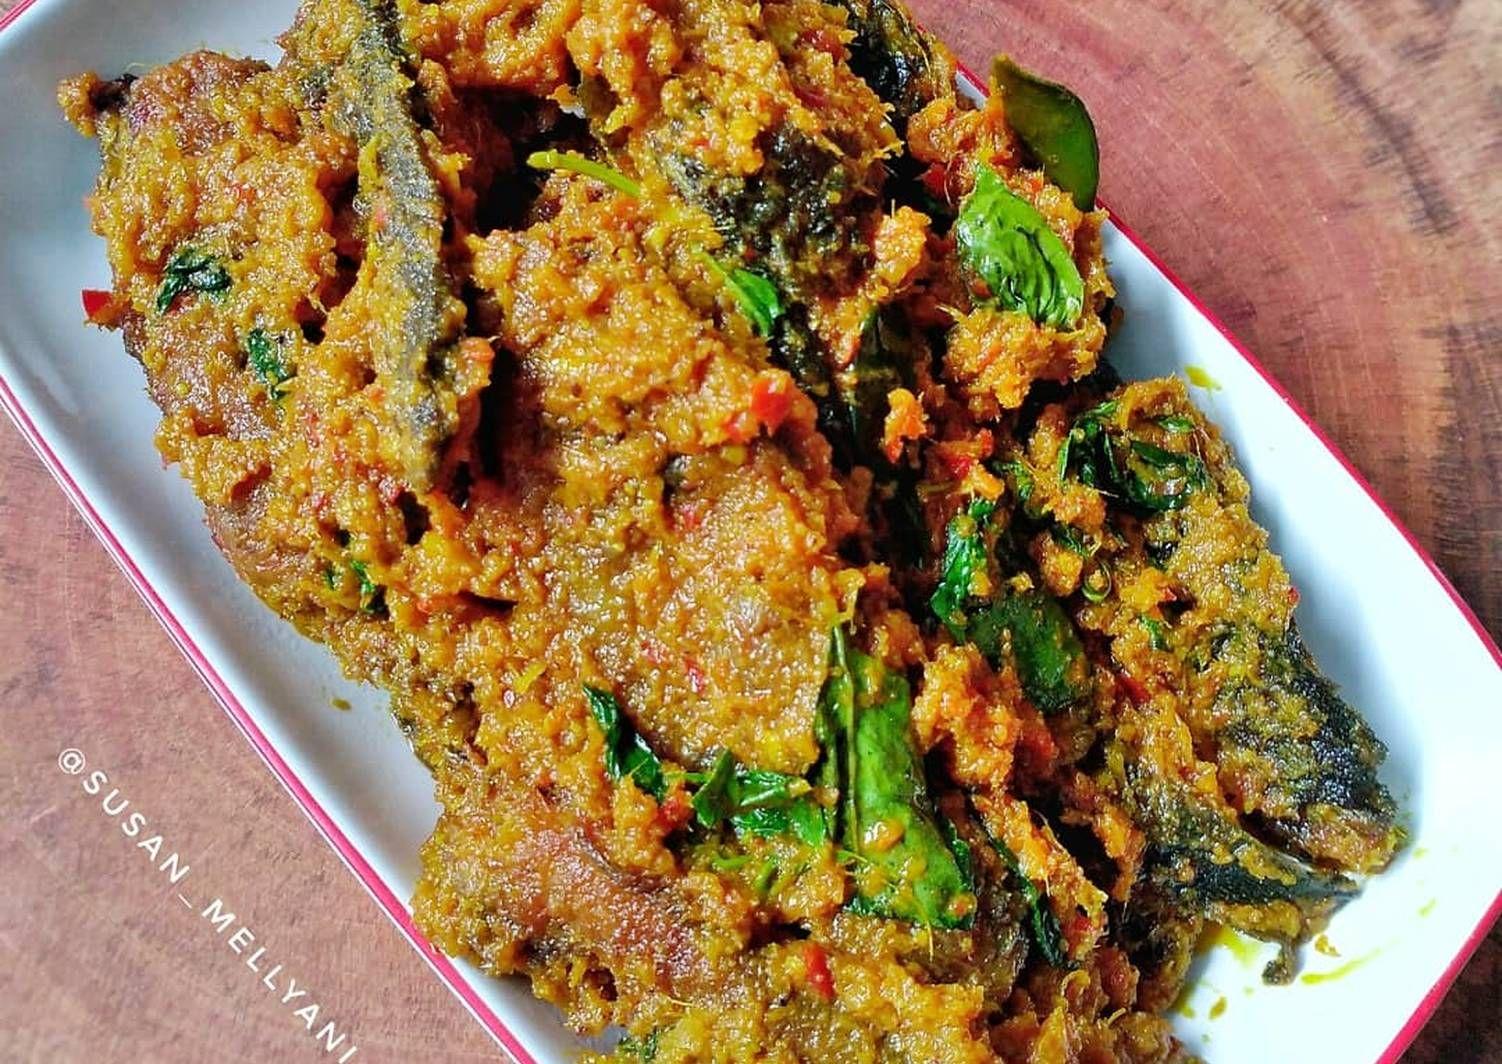 Resep Rica Rica Ikan Lele Oleh Susan Mellyani Resep Makanan Resep Masakan Indonesia Resep Masakan